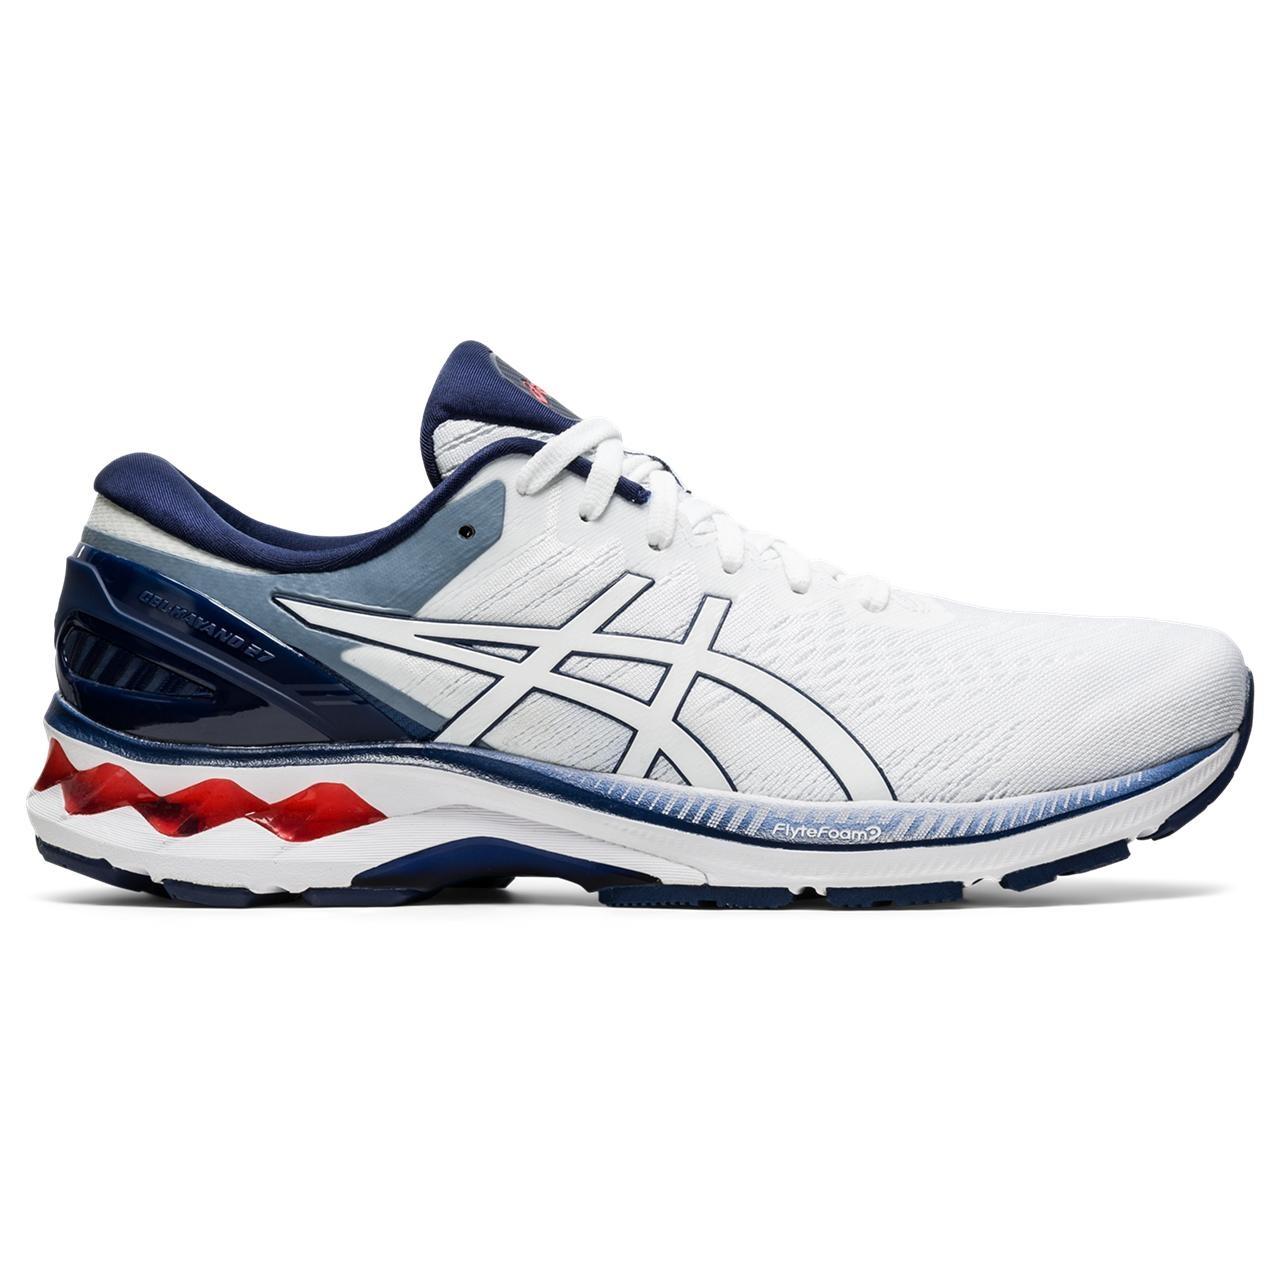 ASICS 1011A767 100 Gel Kayano 27 White Peacoat Men's Running Shoes